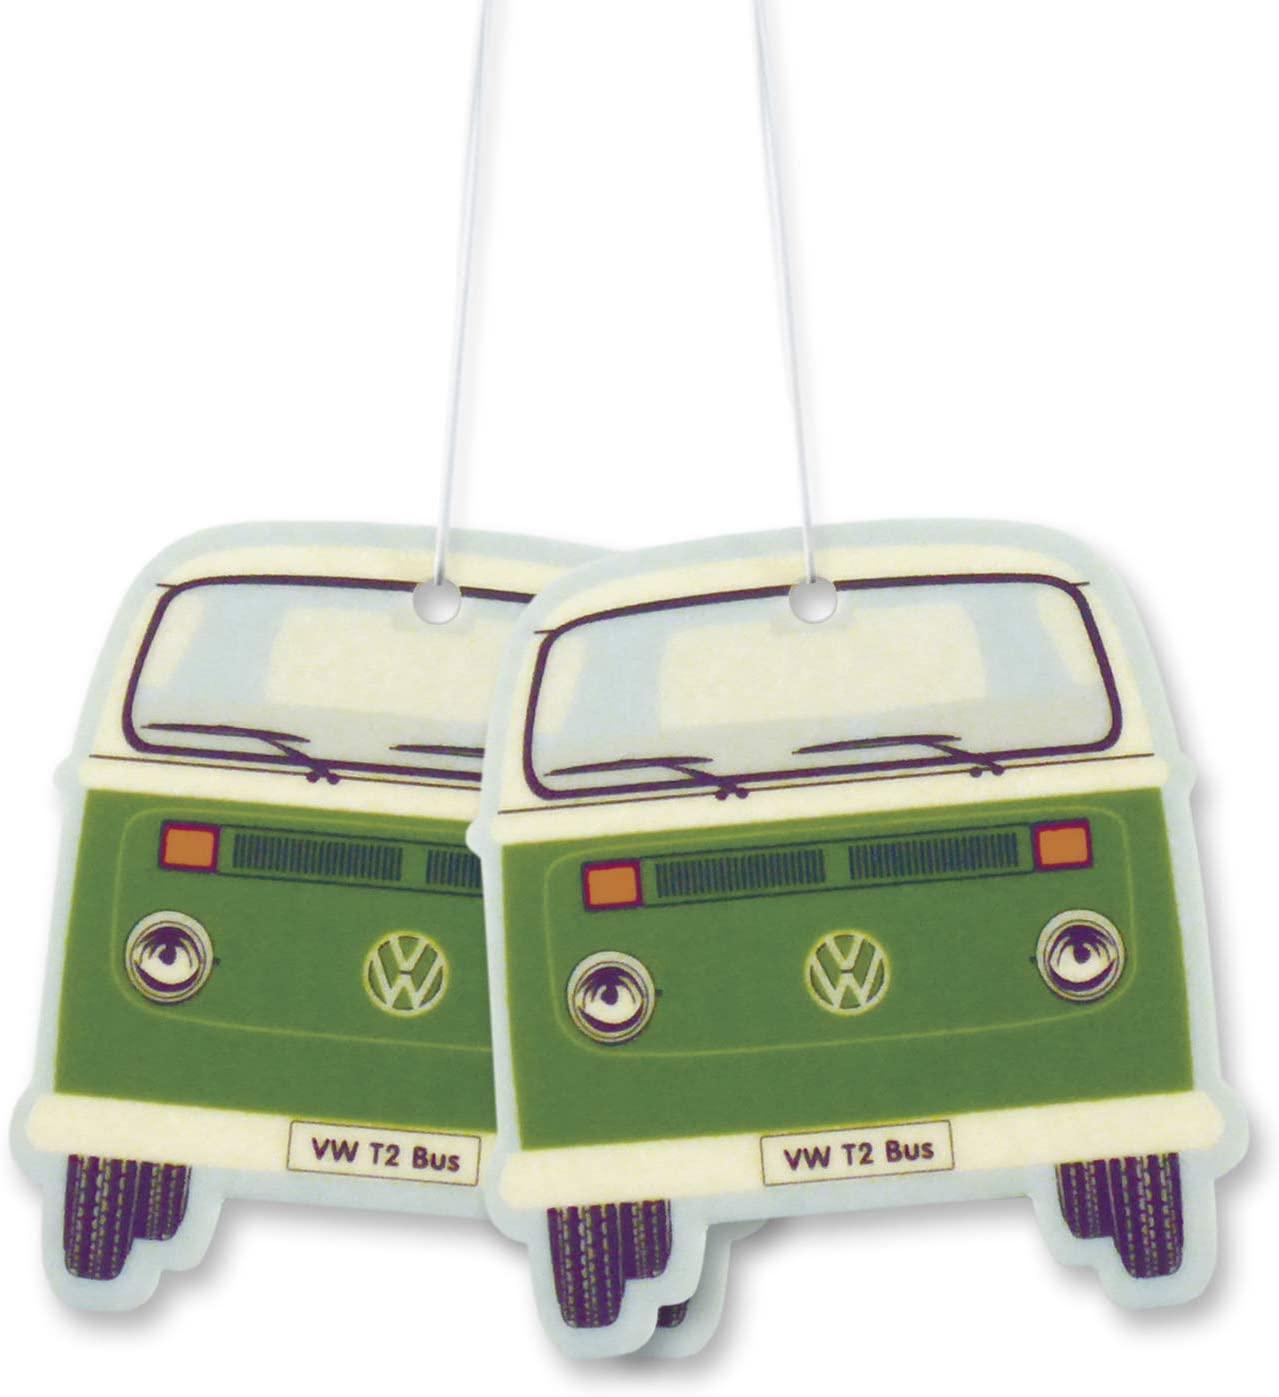 BRISA VW Collection - Volkswagen Scented Car Air Freshener Fragrance Deodorizer for Car/Auto or Home with Volkswagen Samba Bus T2 Camper Van Front Design (Green Tea/Green/2-pc Set)